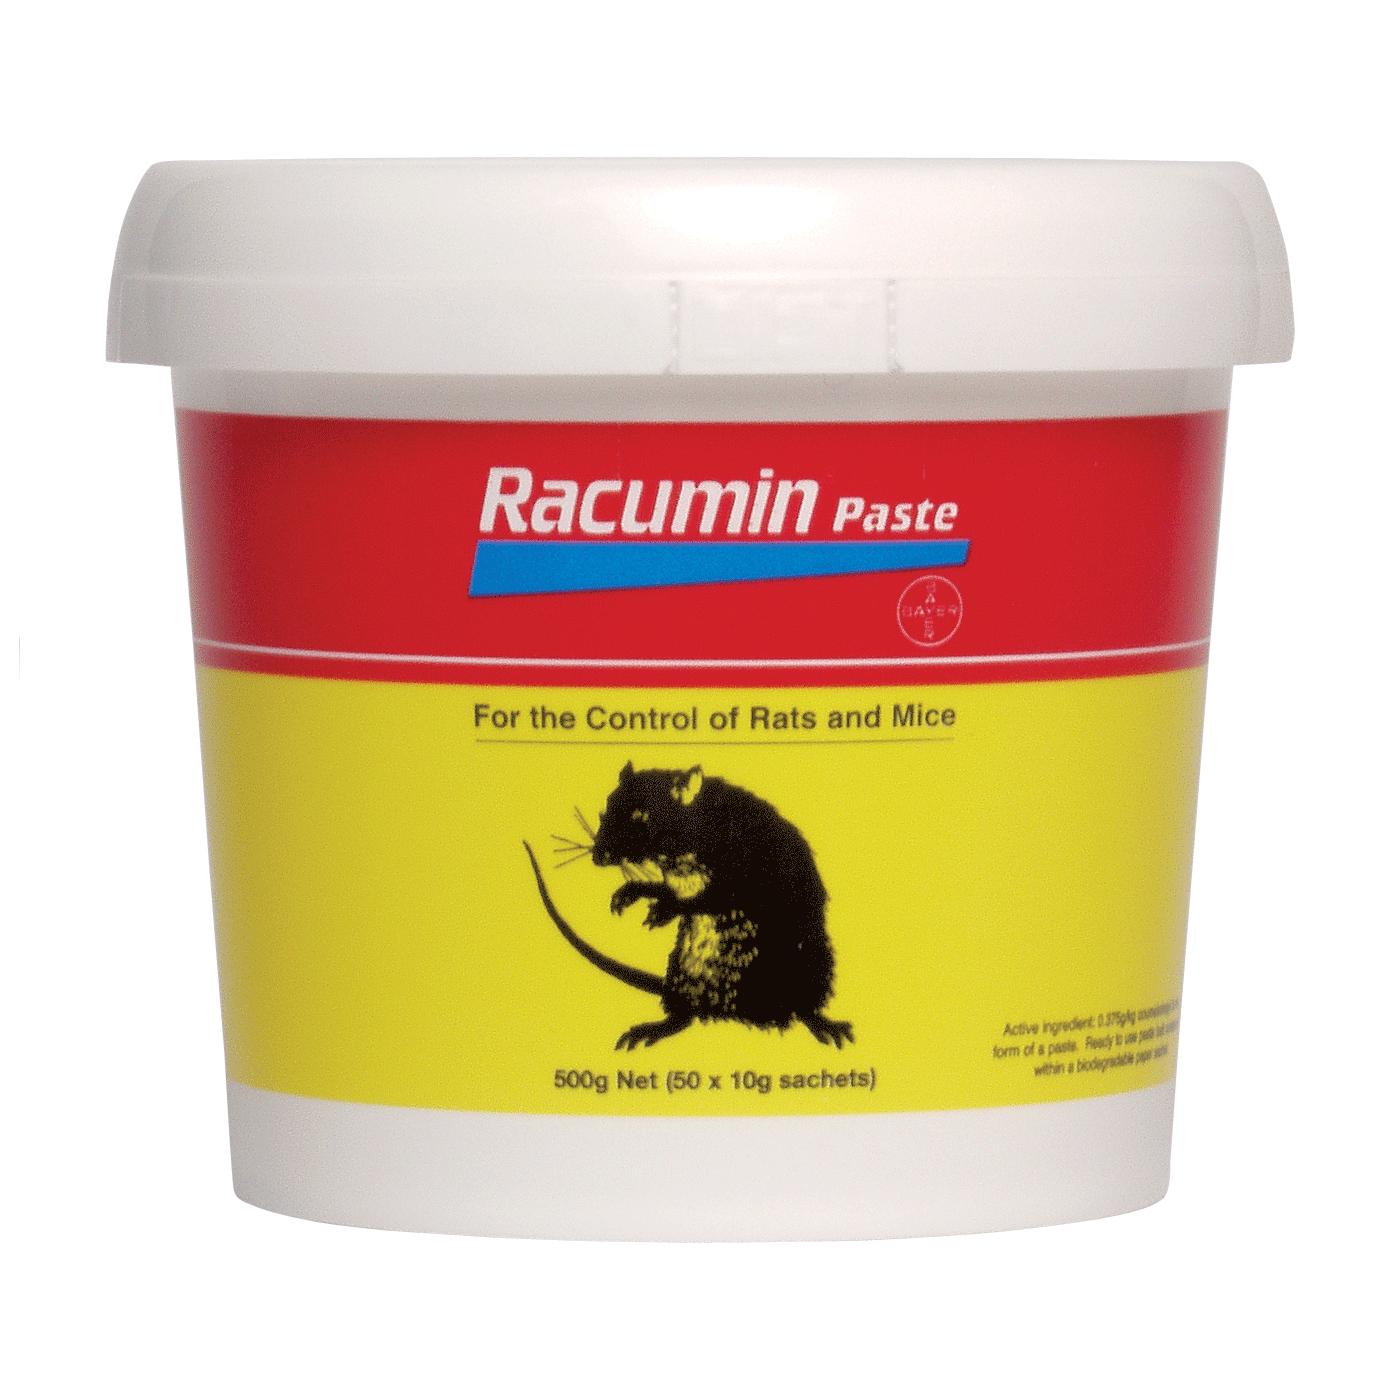 Racumin Paste